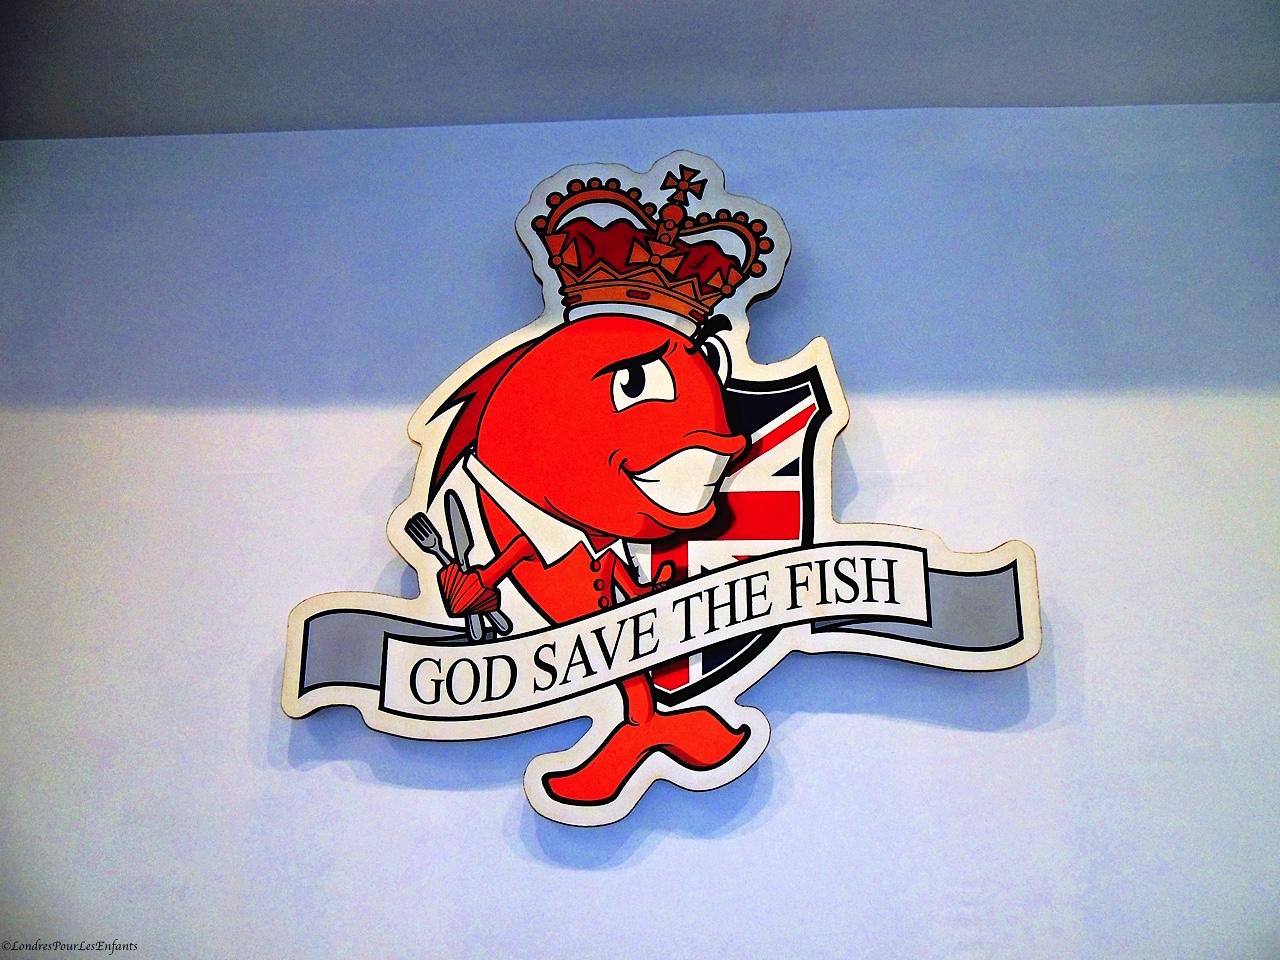 God save the fish 20 3